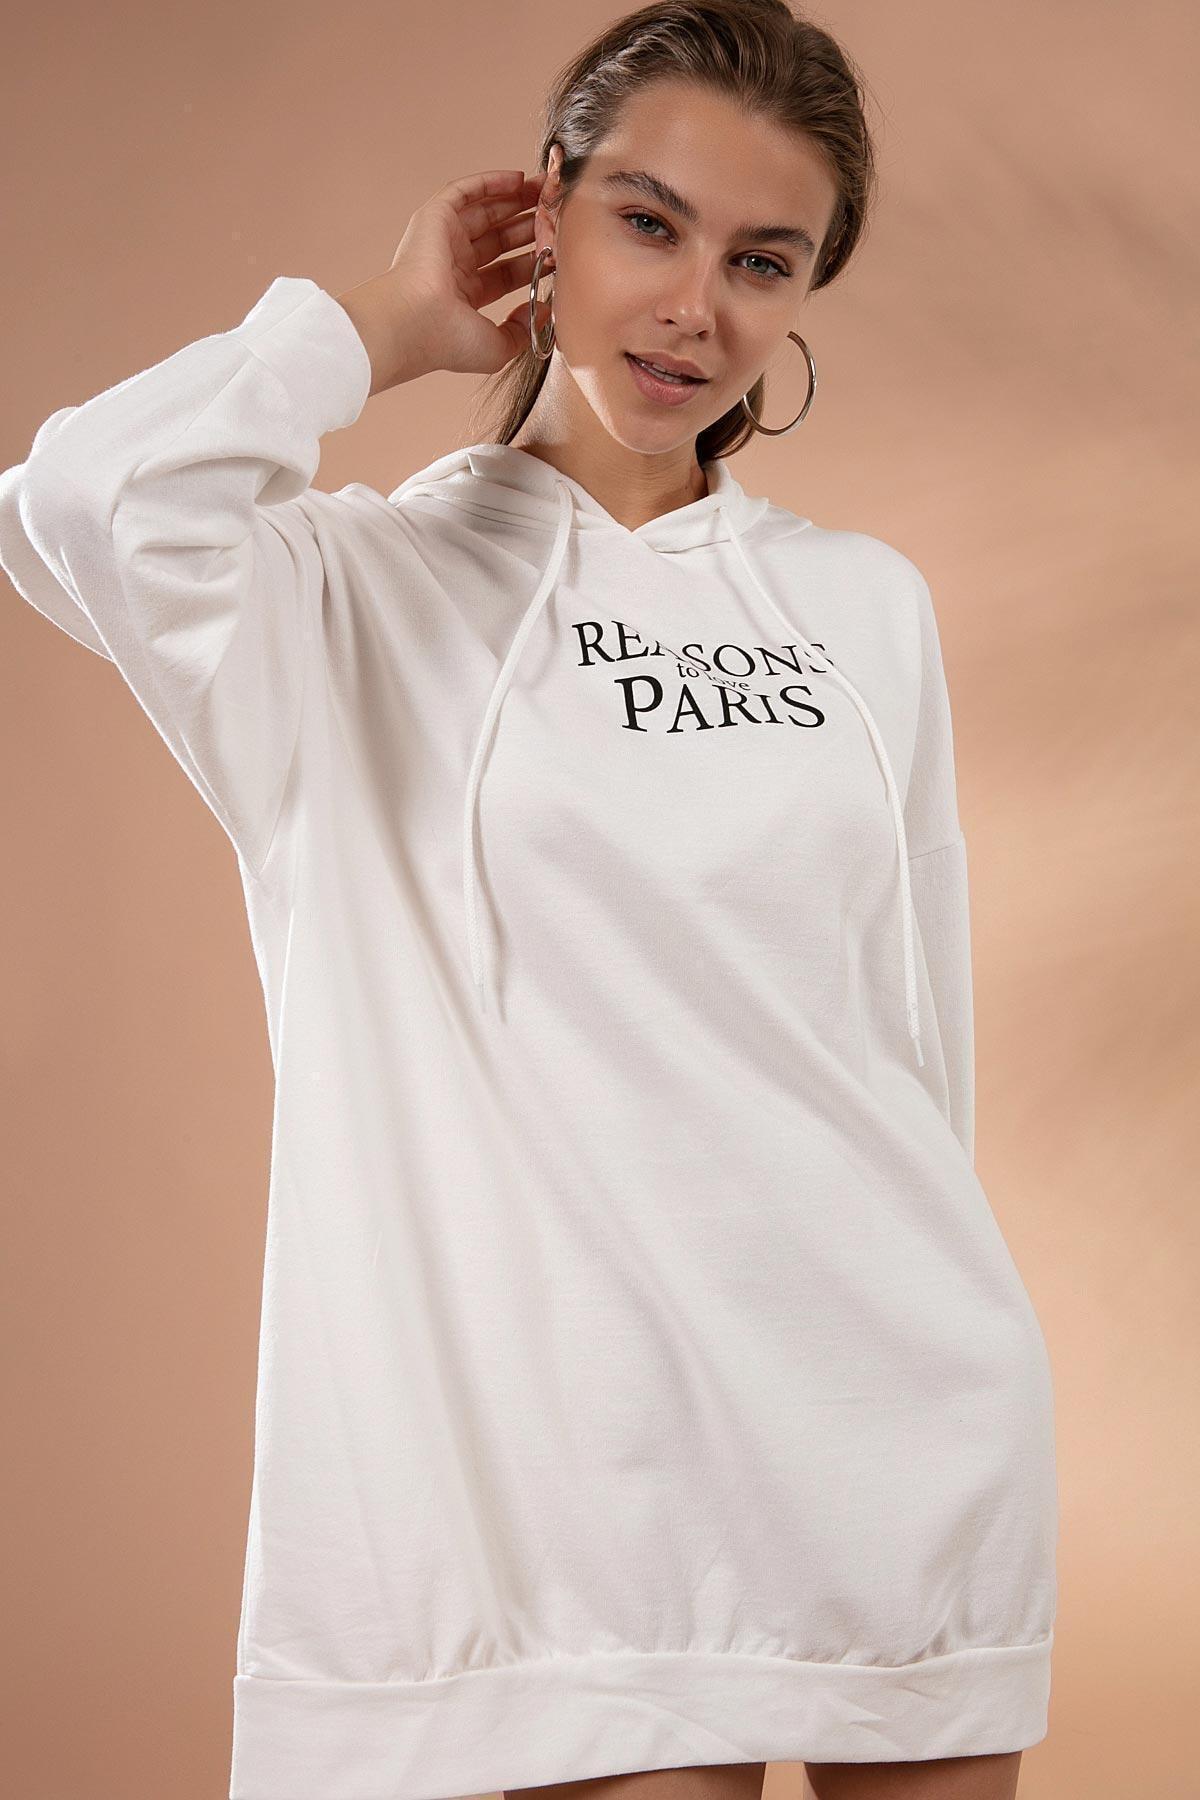 Pattaya Kadın Oversize Sweatshirt Elbise Y20w110-51355 2